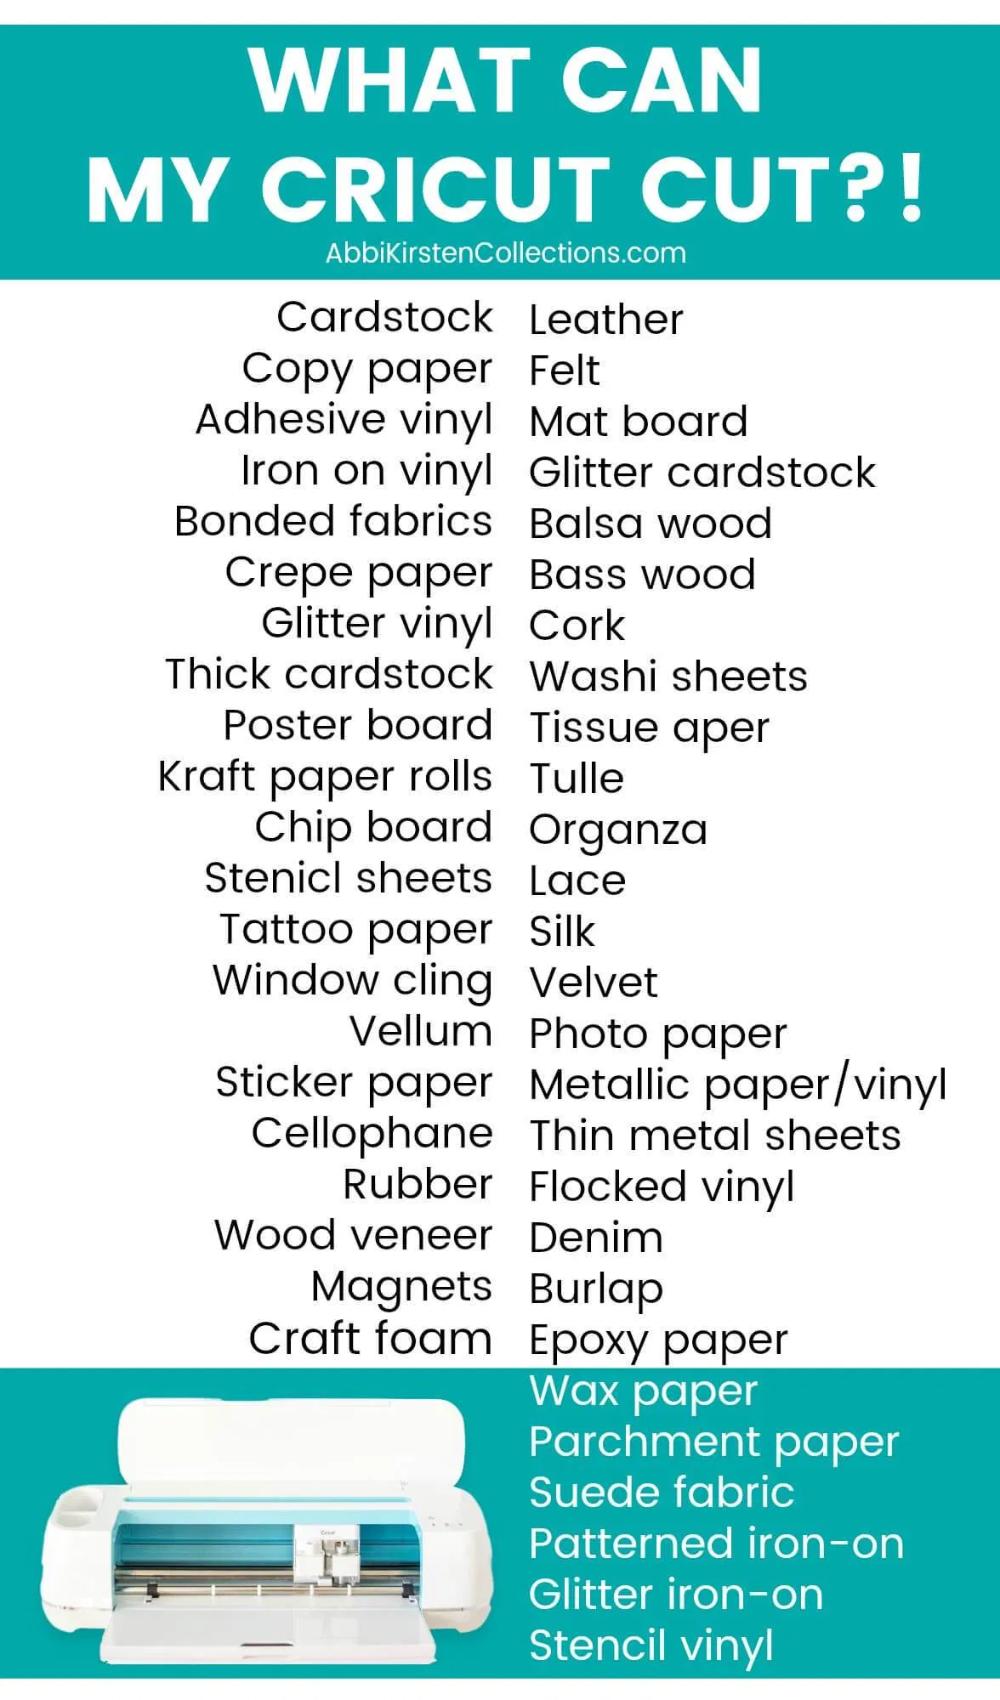 The Best Materials for Cricut Explore and Cricut Maker ...